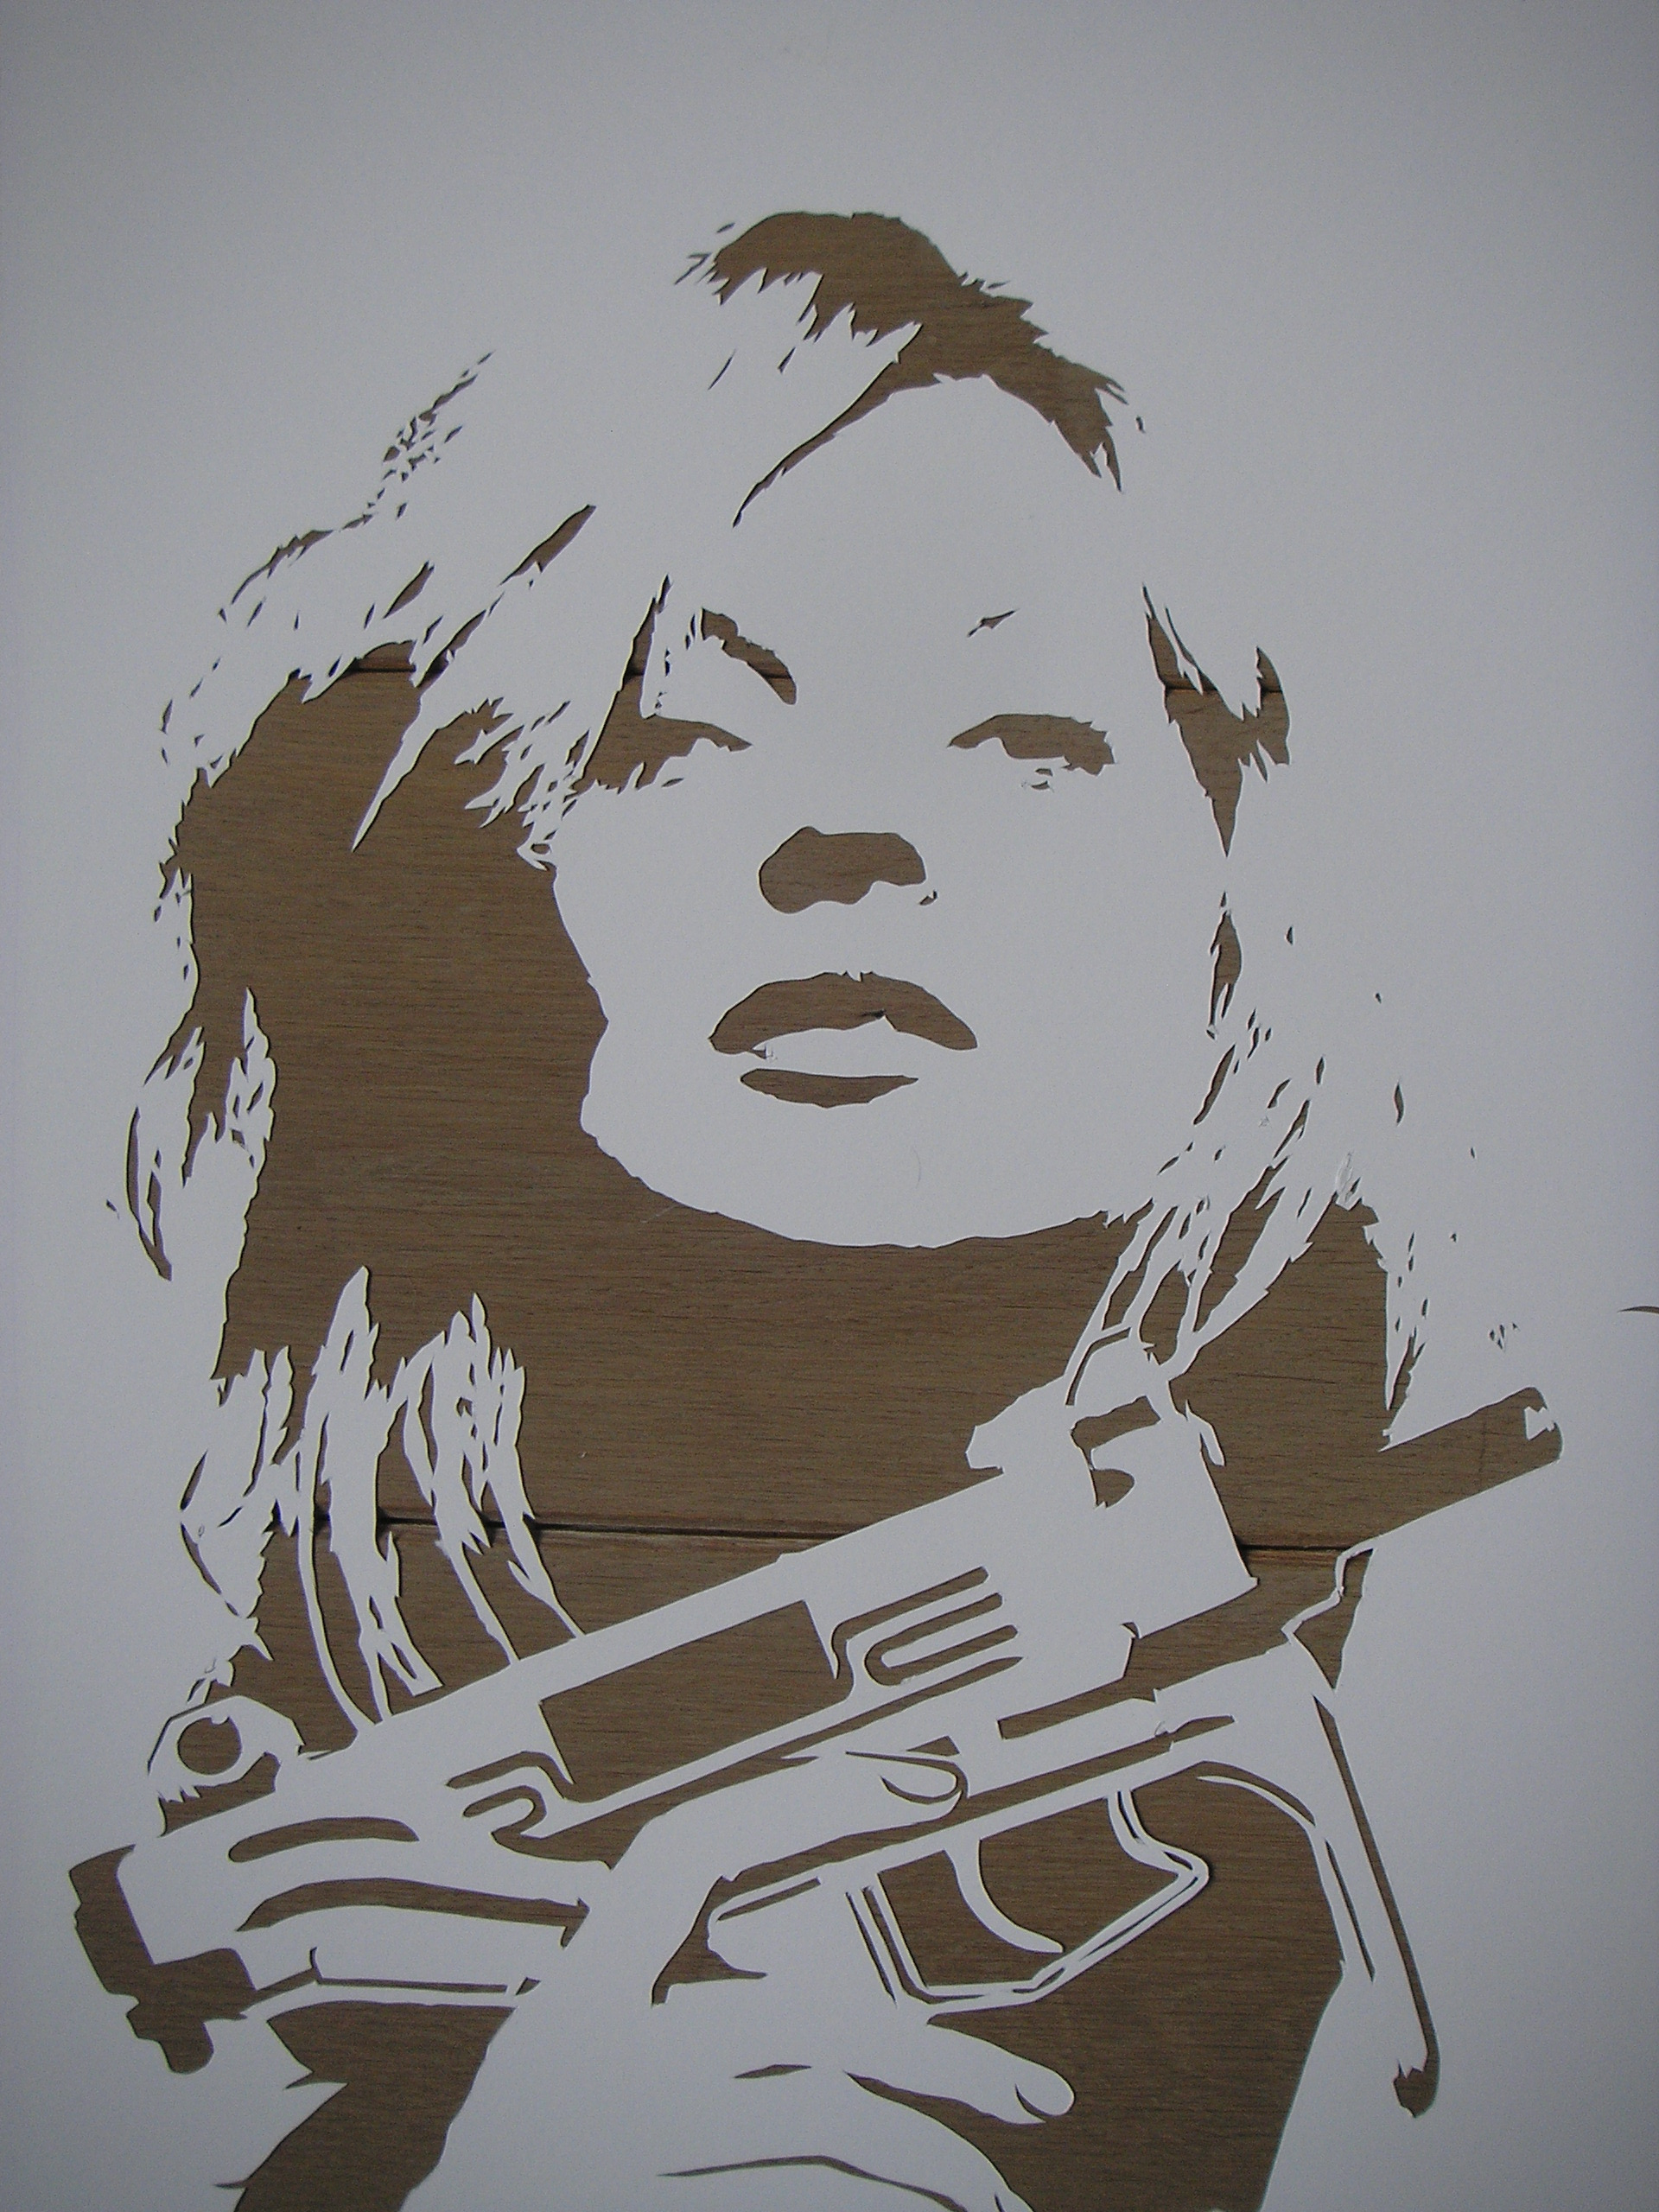 It is an image of Printable Spray Paint Stencils regarding pattern